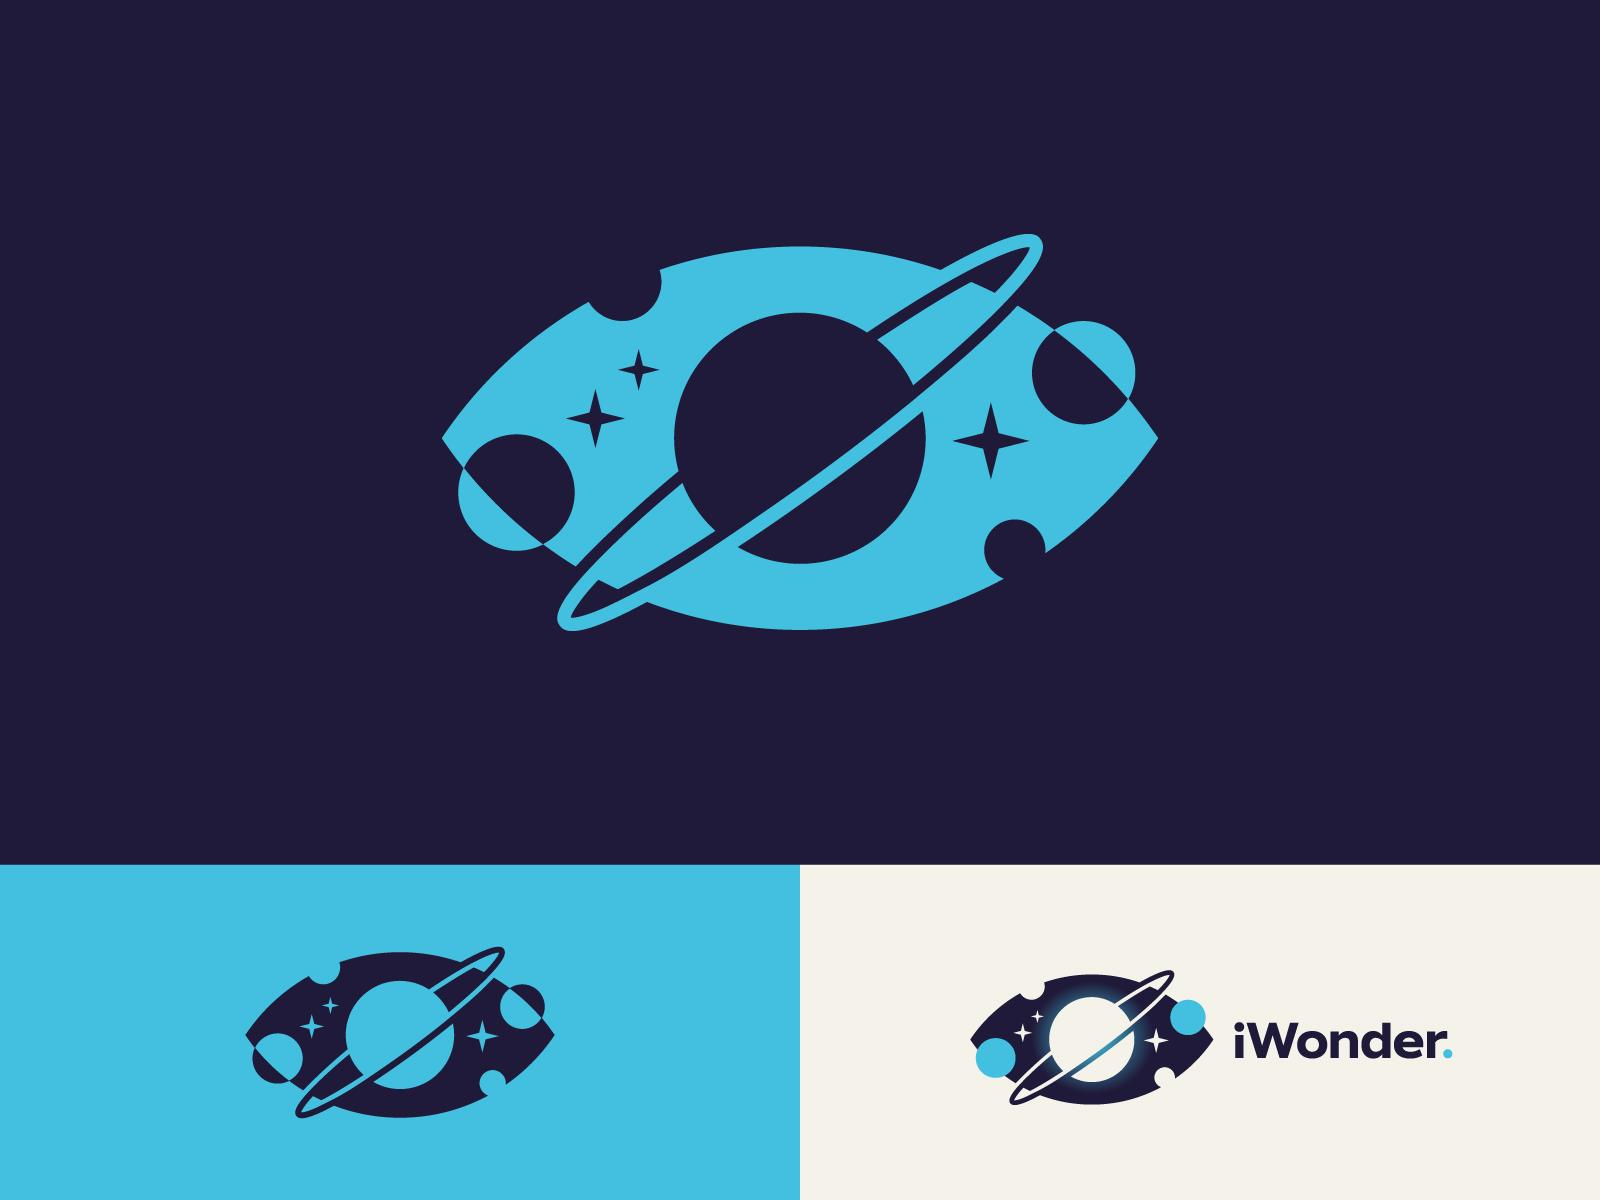 Iwonder logo mbb